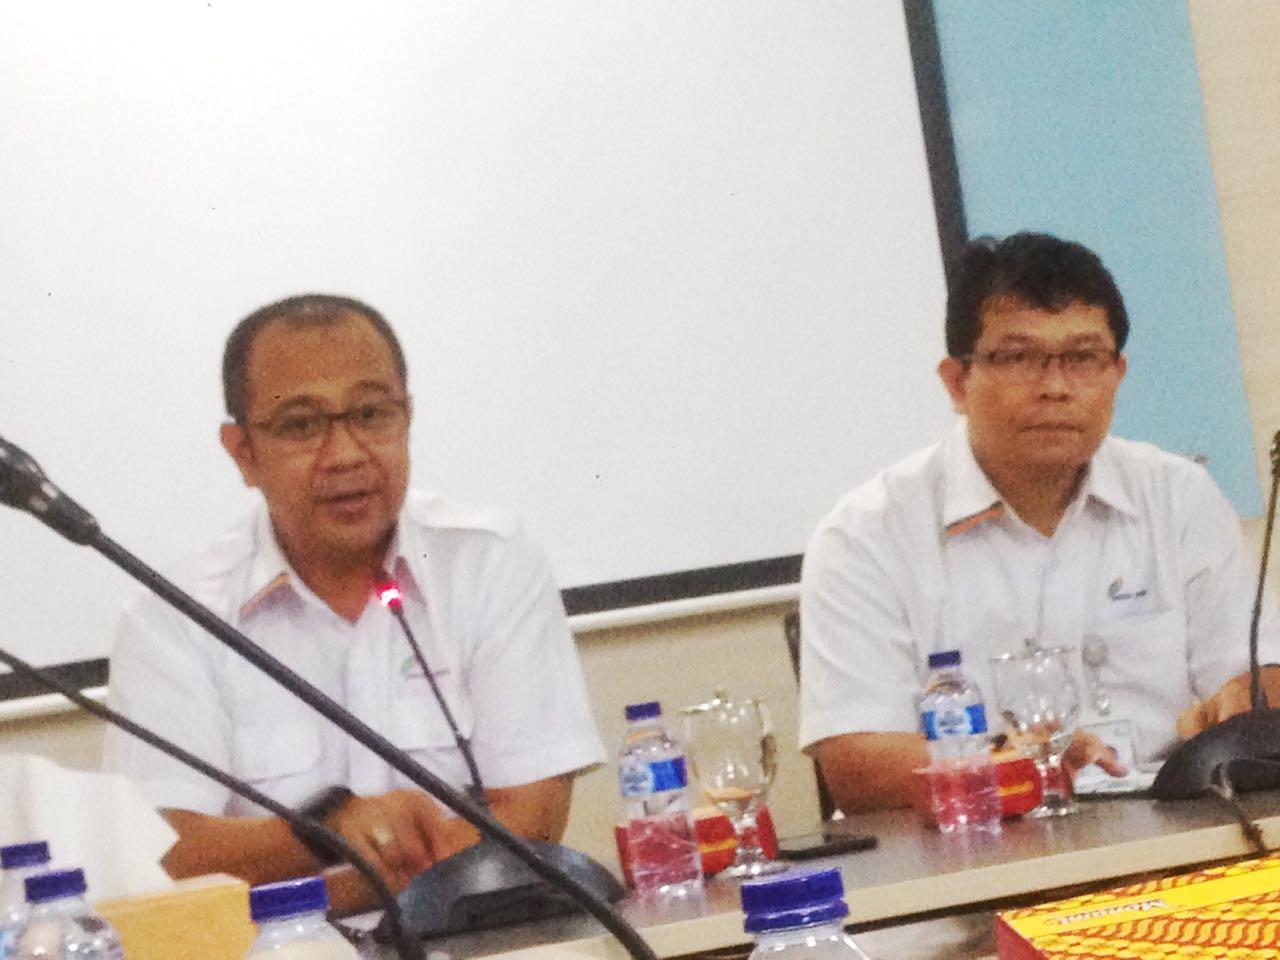 Capaian PD Pasar Jaya Selama 2017: Mulai Jaga Inflasi, Perbaikan Pasar Rusak, Hingga Pembinaan Pedagang